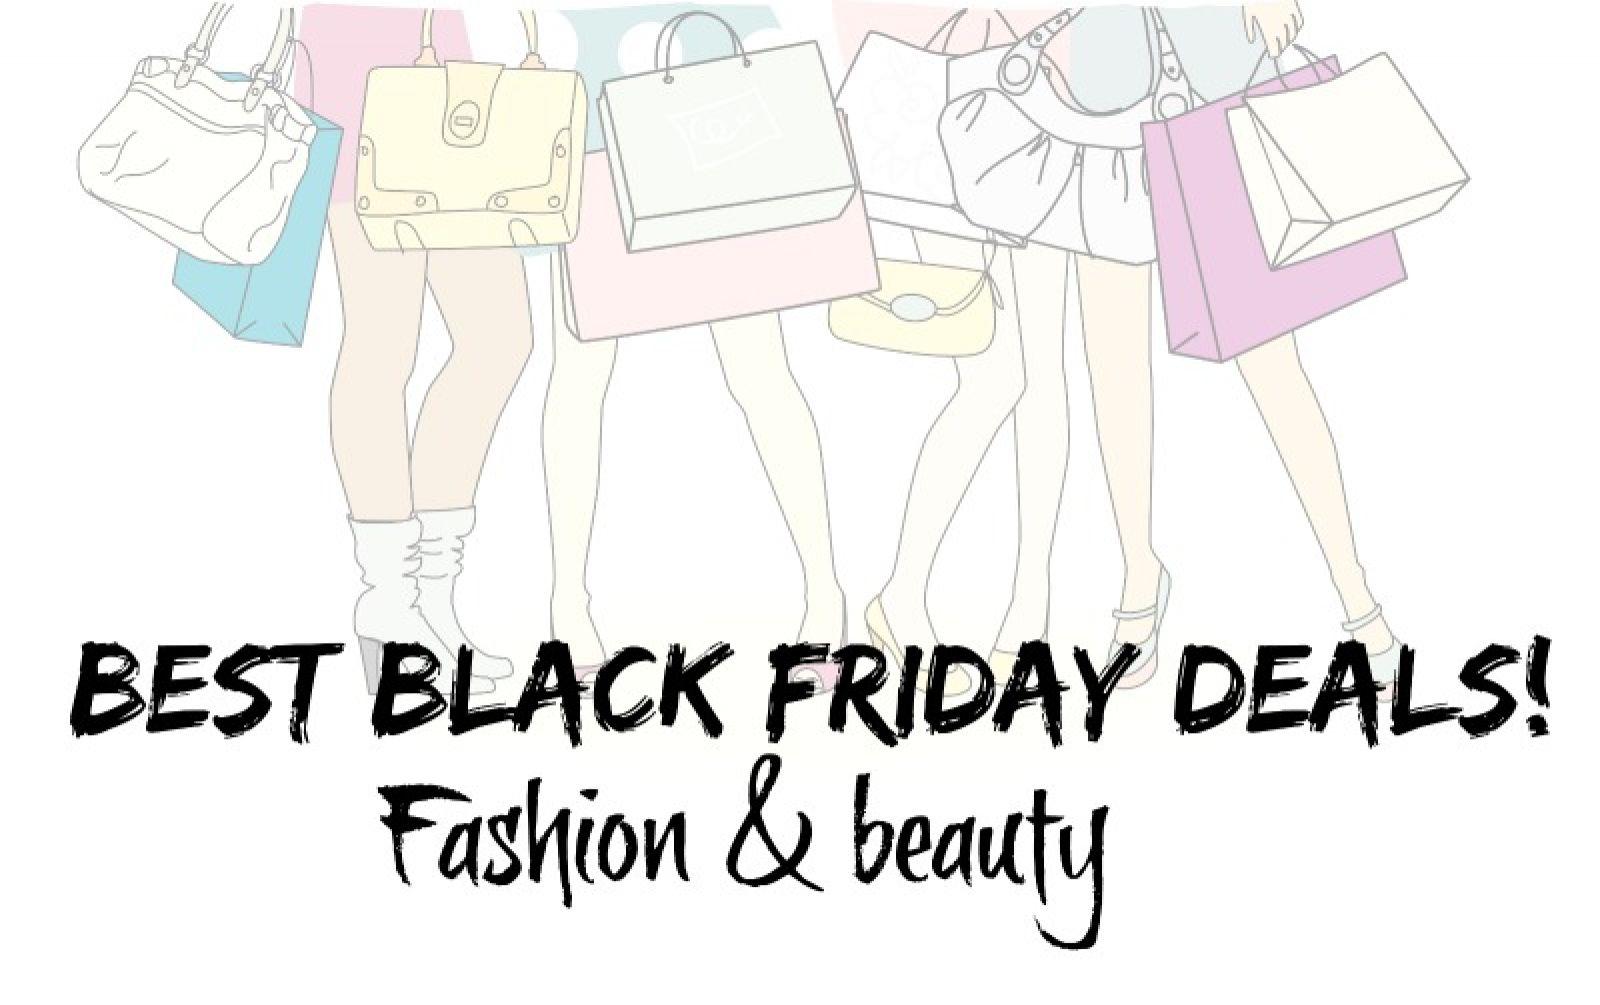 Best Black Friday Deals! Fashion, Accessories & Beauty